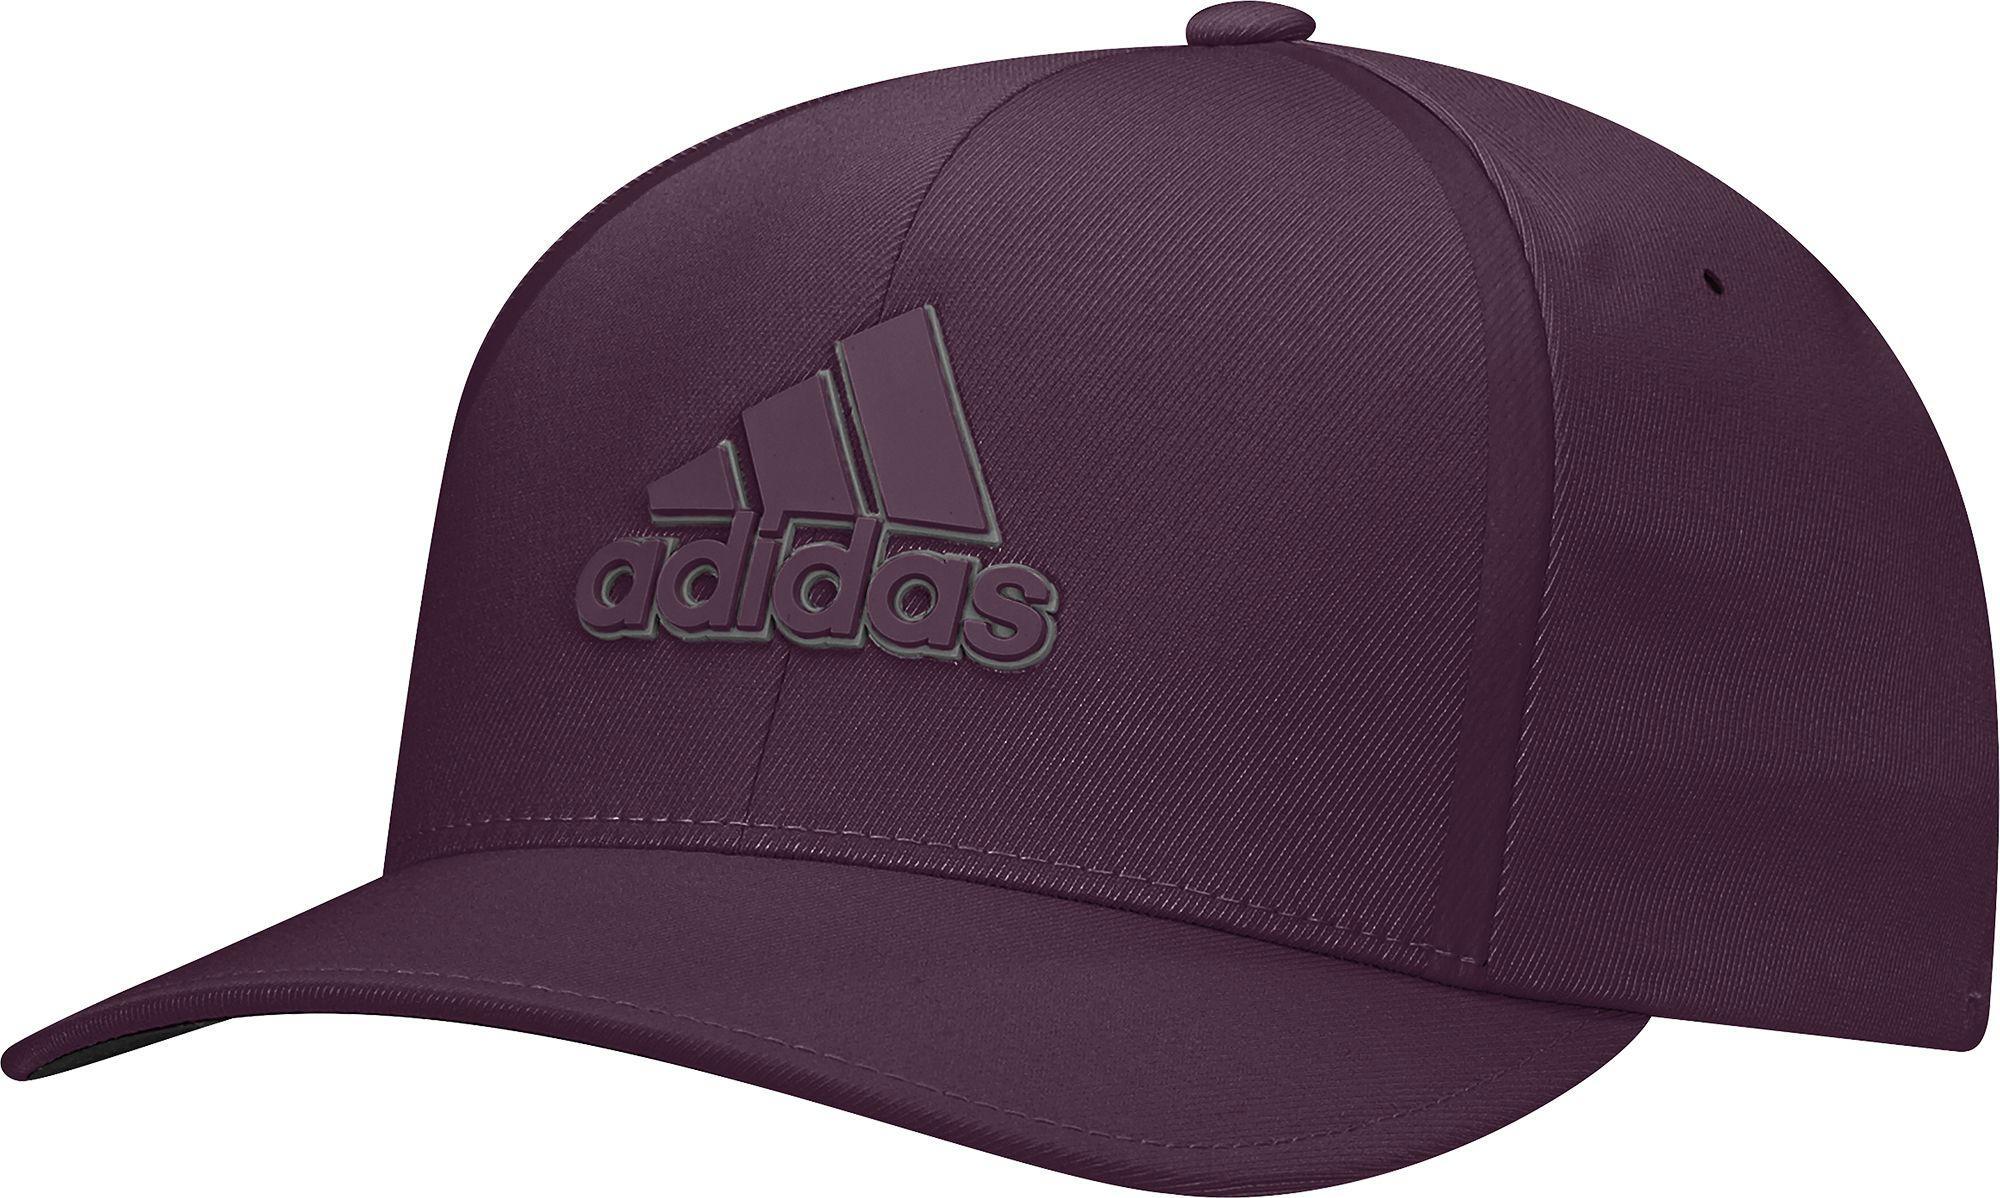 Lyst - adidas Tour Delta Textured Golf Hat in Purple for Men 6bb8d4dede60